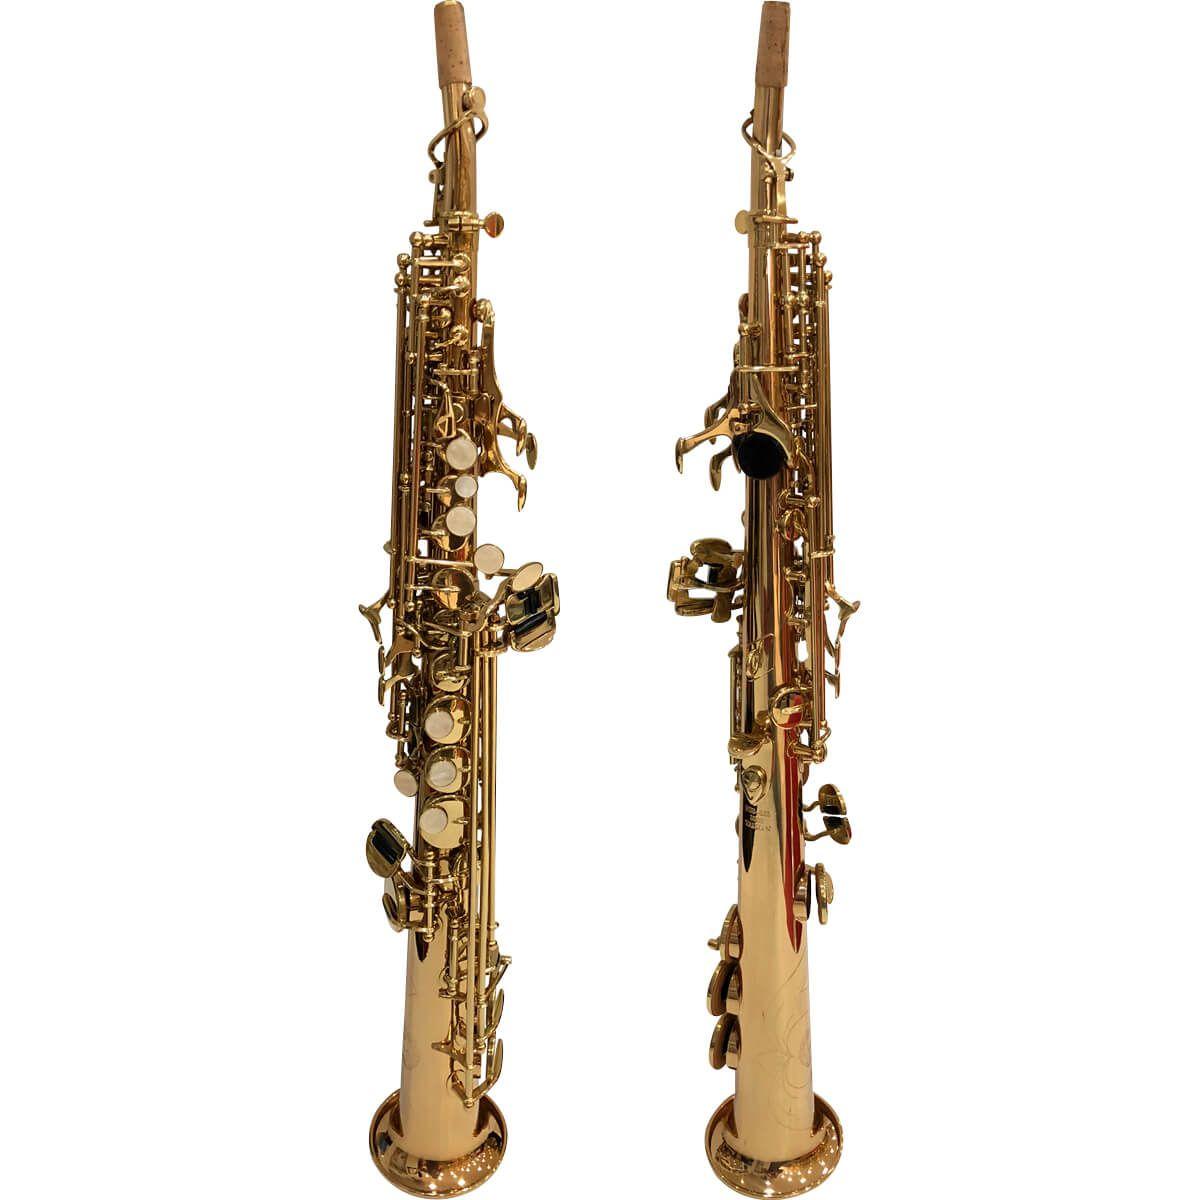 Sax Soprano - Dourado - Pss-861 - Premier